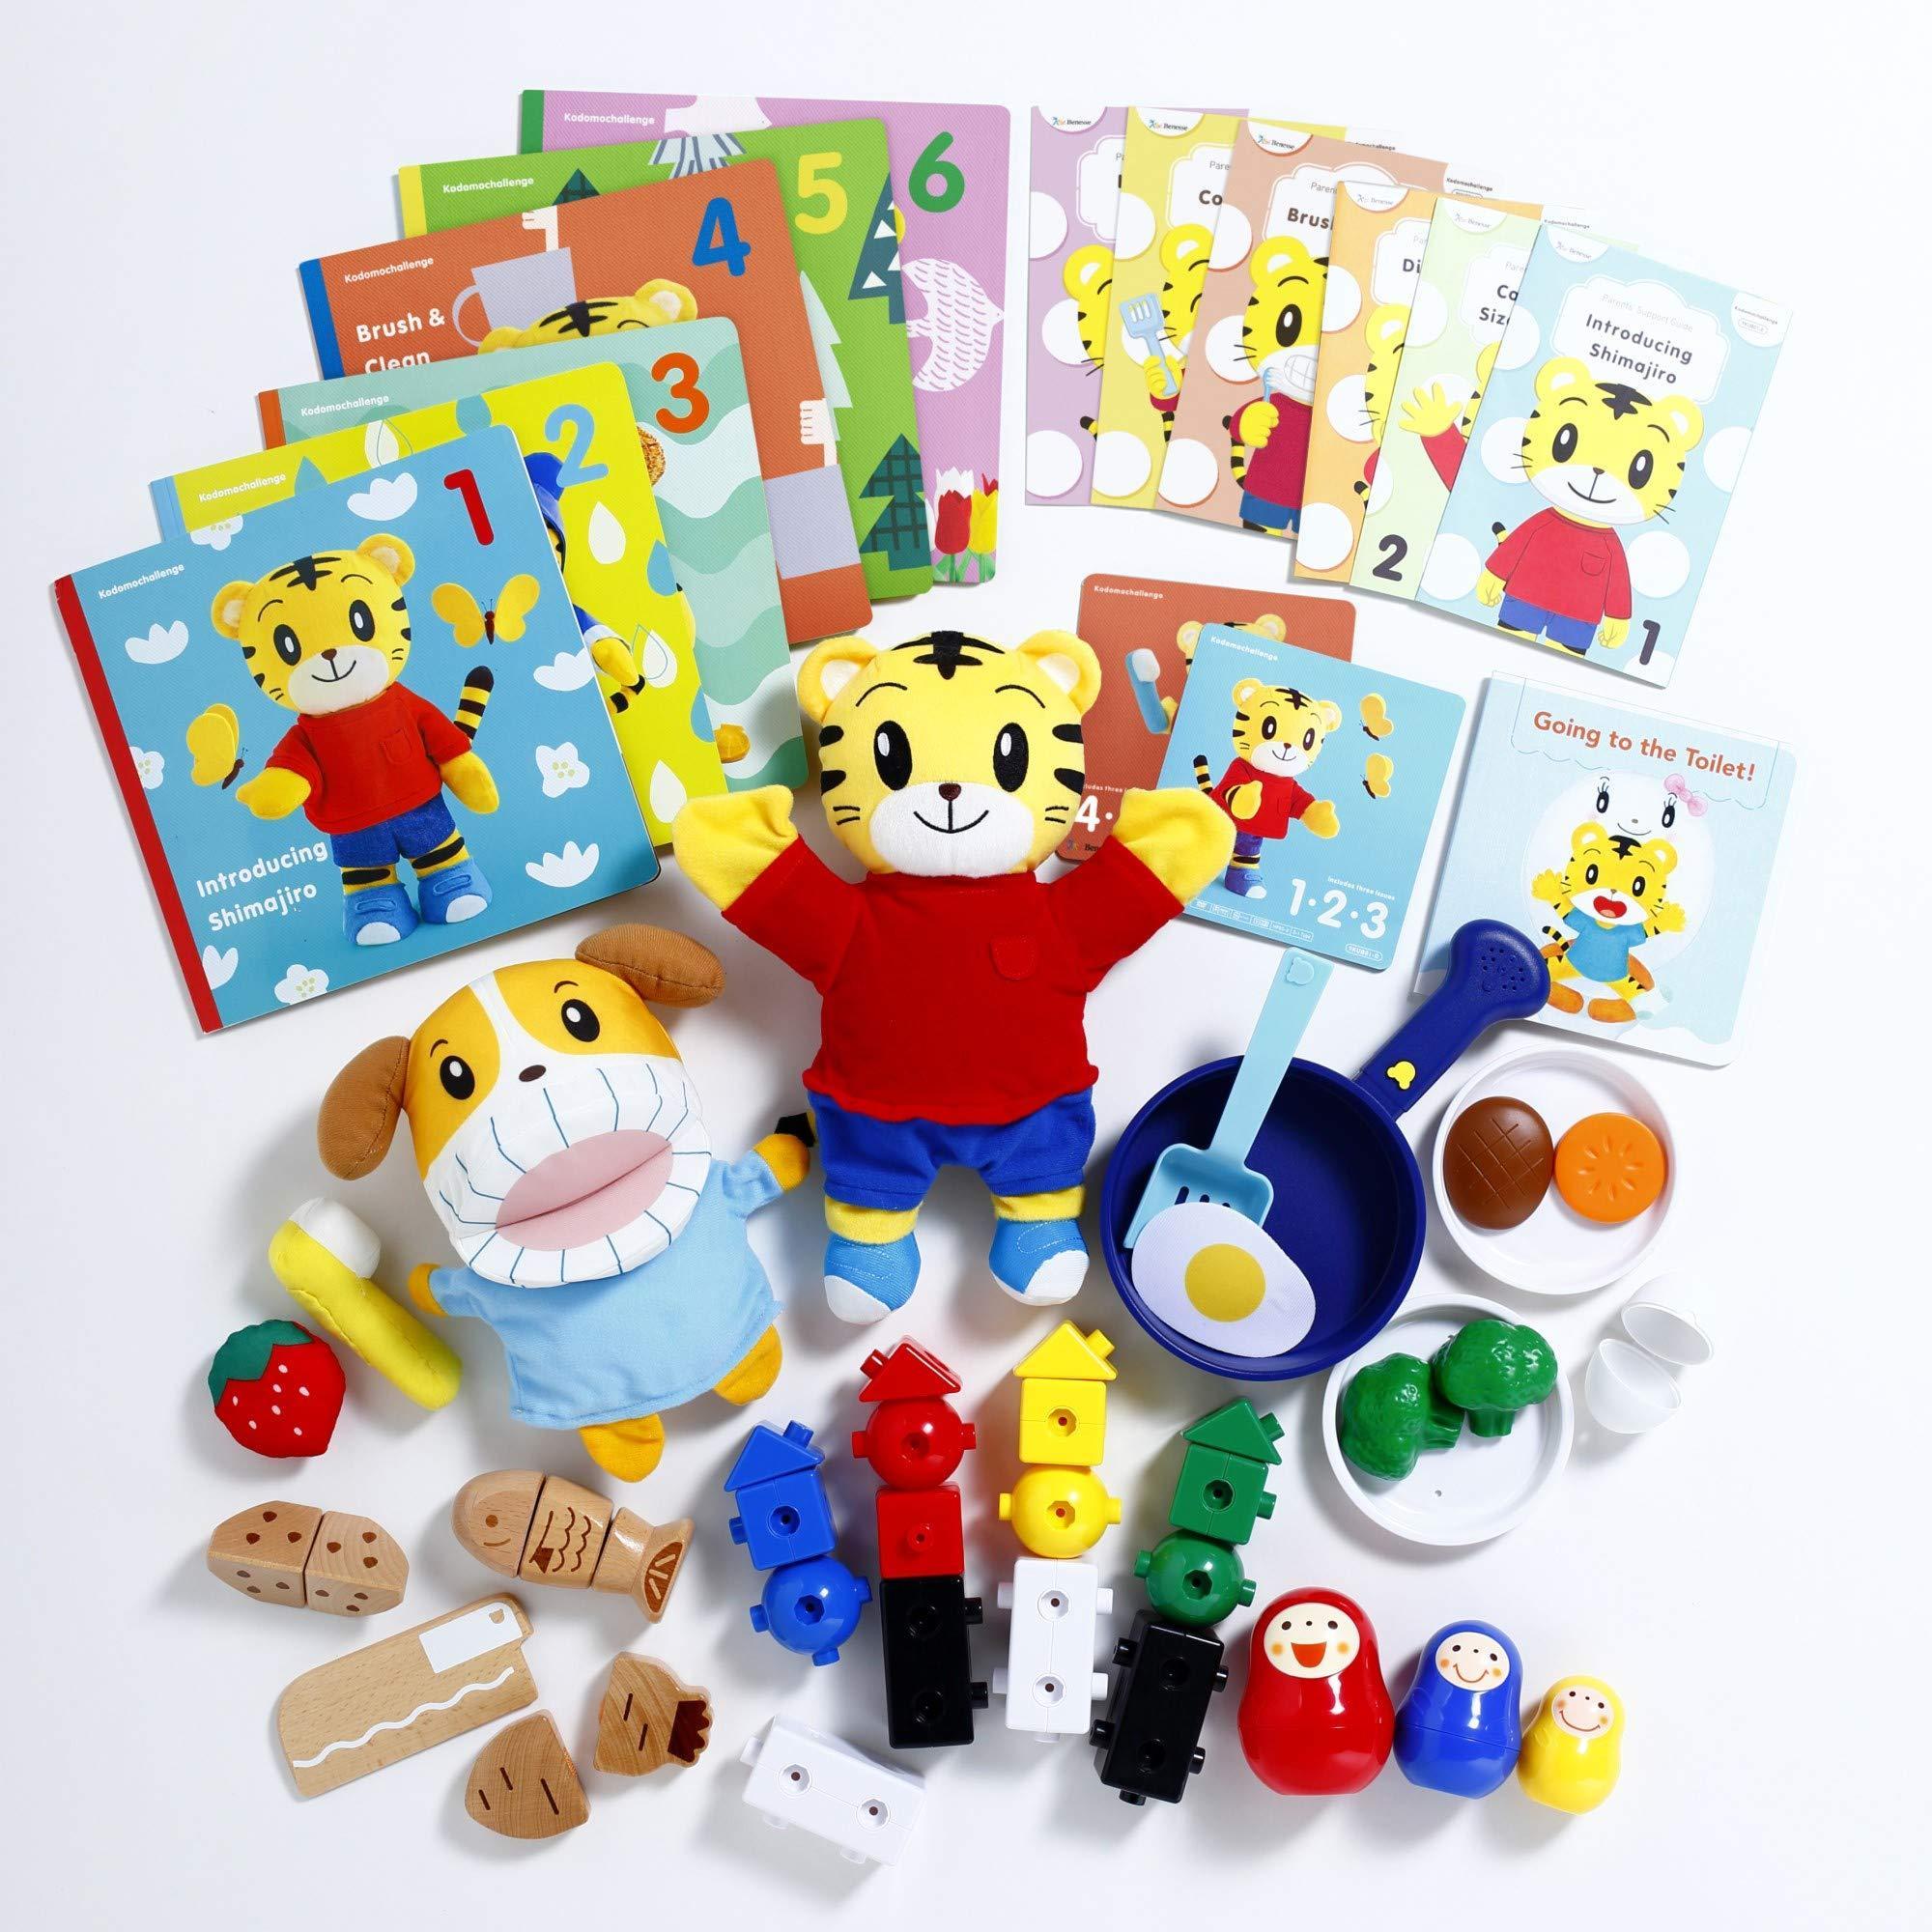 SHIMAJIRO-Kodomochallenge- Home Learning Subscription Box: 1-2 years old